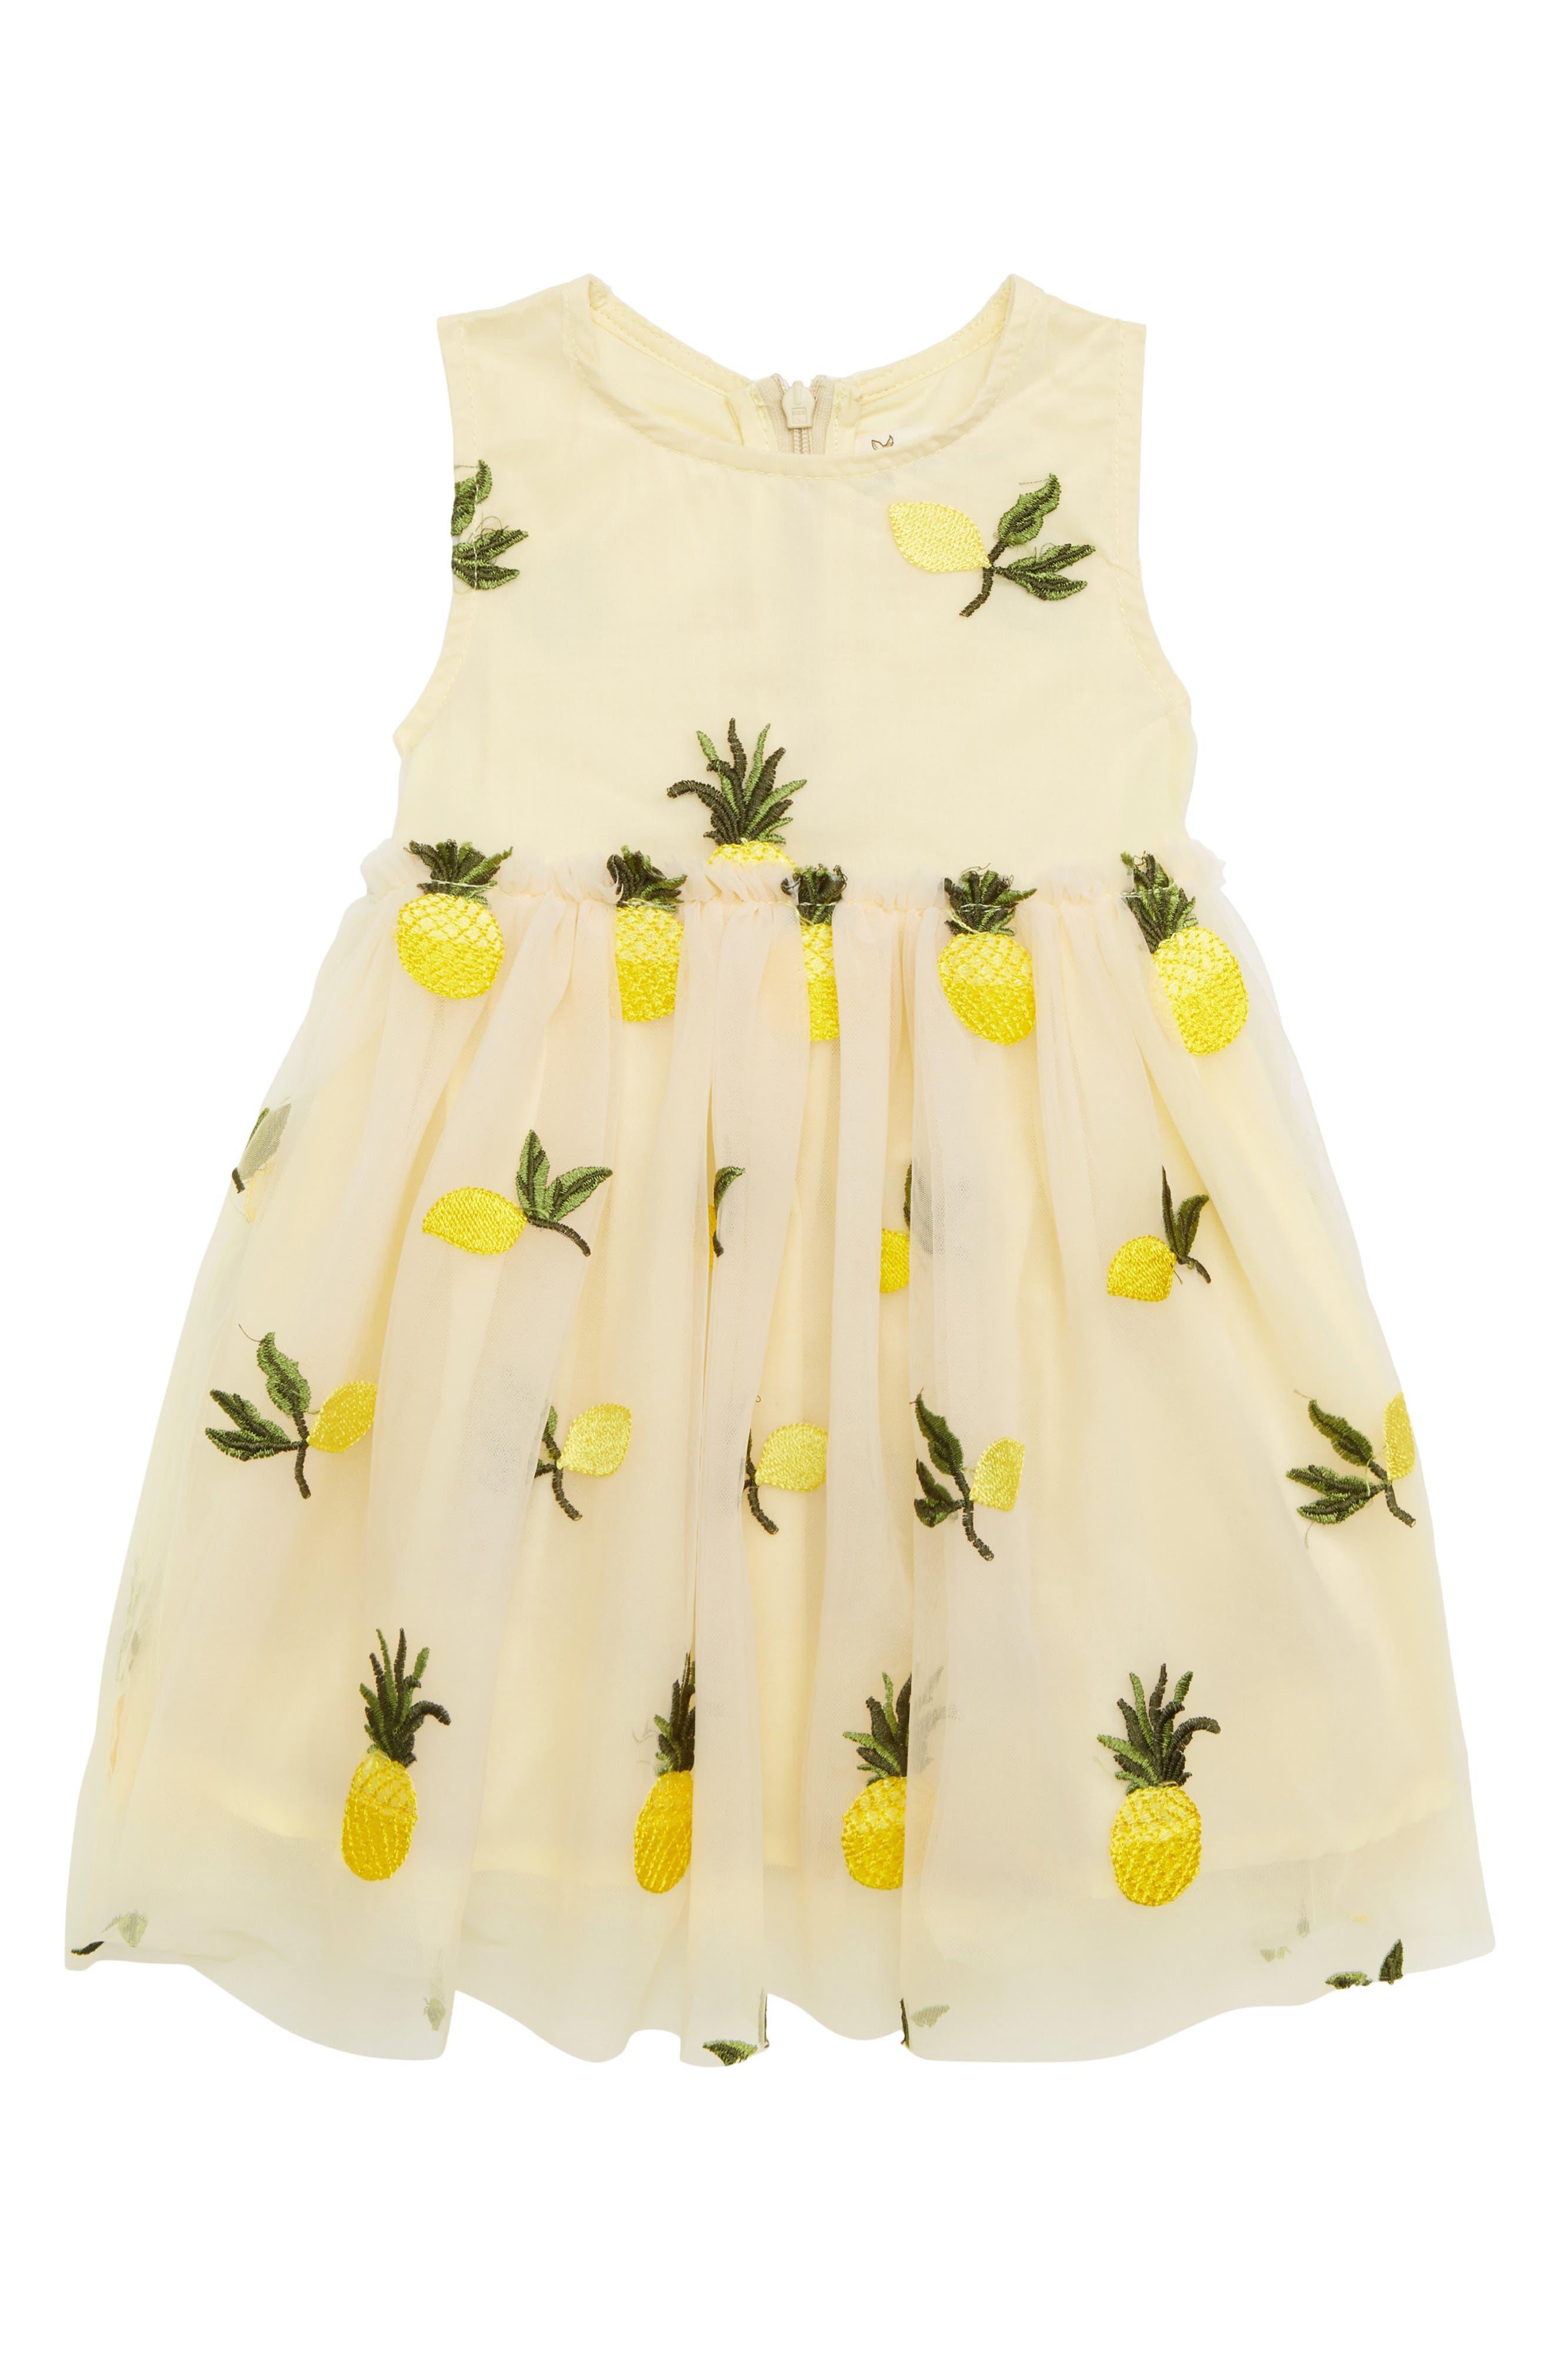 Pineapple & Lemon Embroidered Dress,                         Main,                         color, Tan